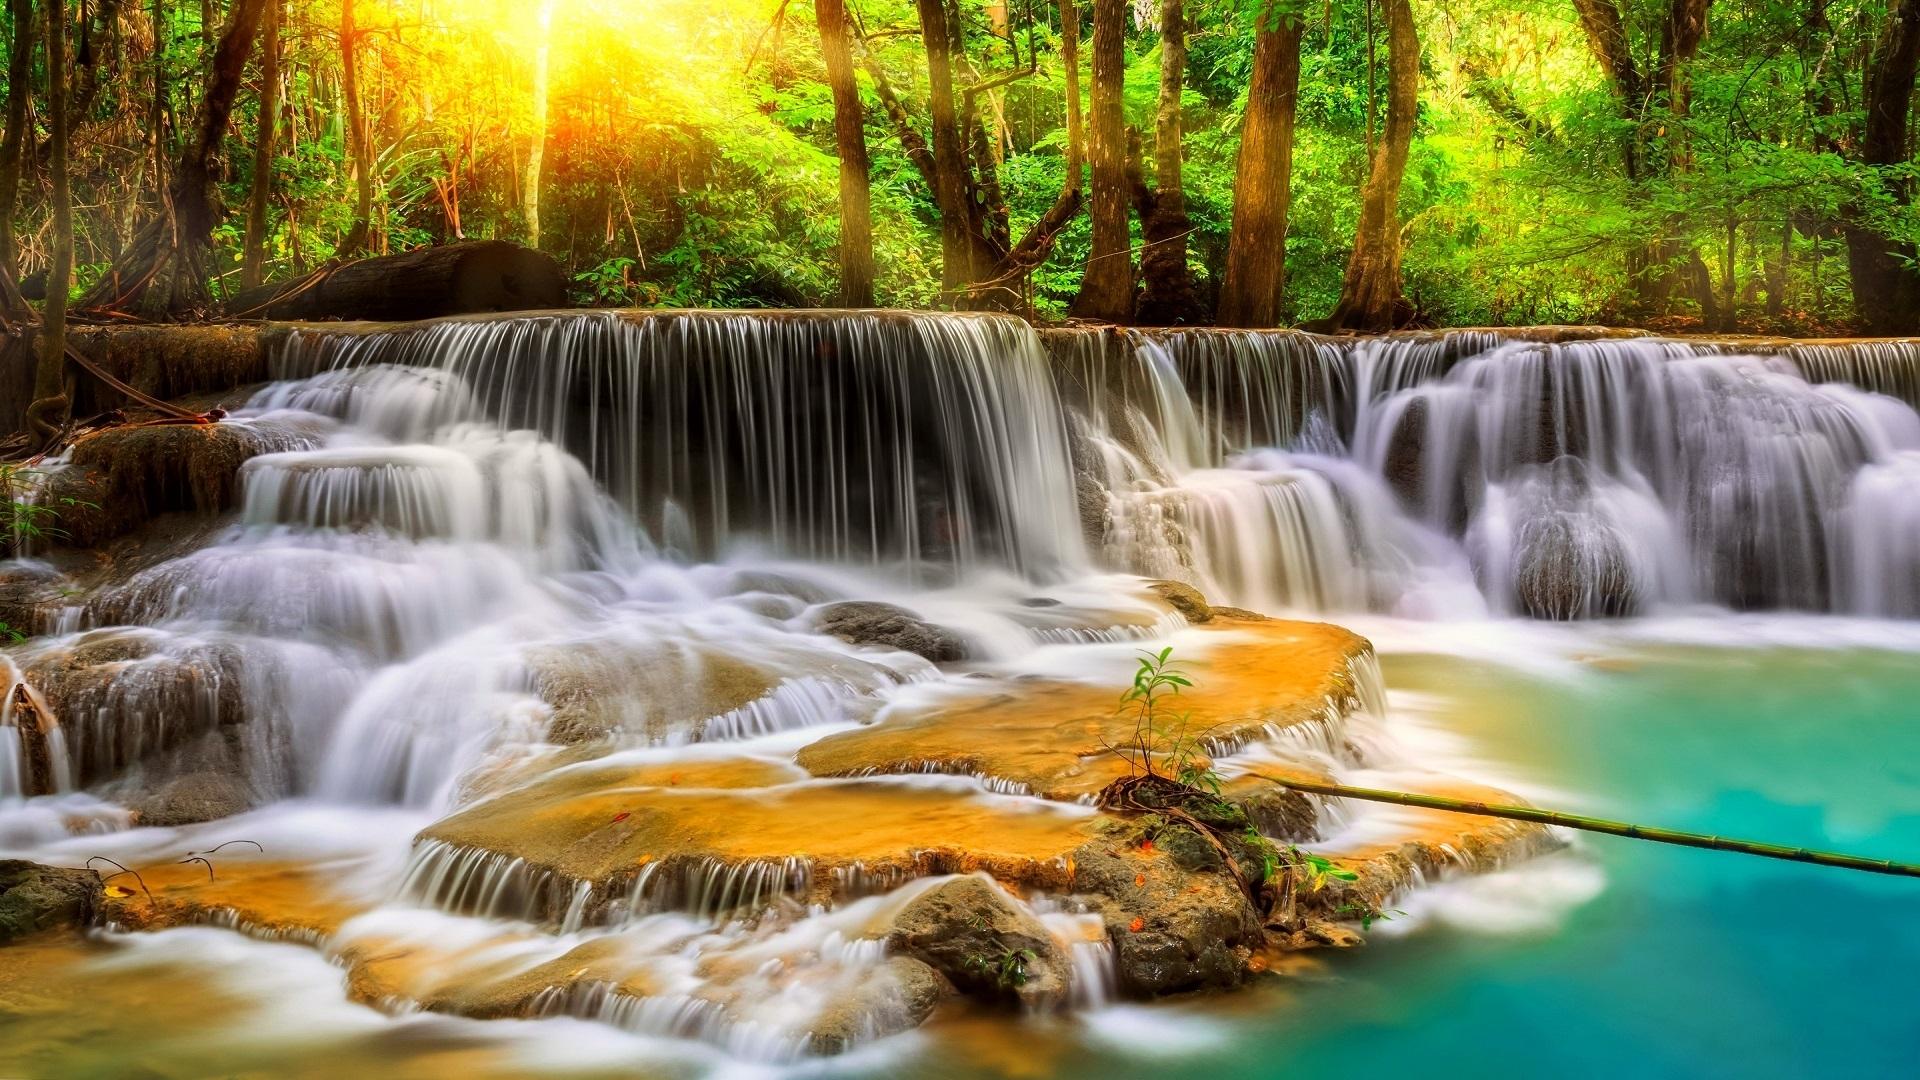 beautiful-waterfalls-hd-wallpaper-free-for-desktop - hd wallpaper